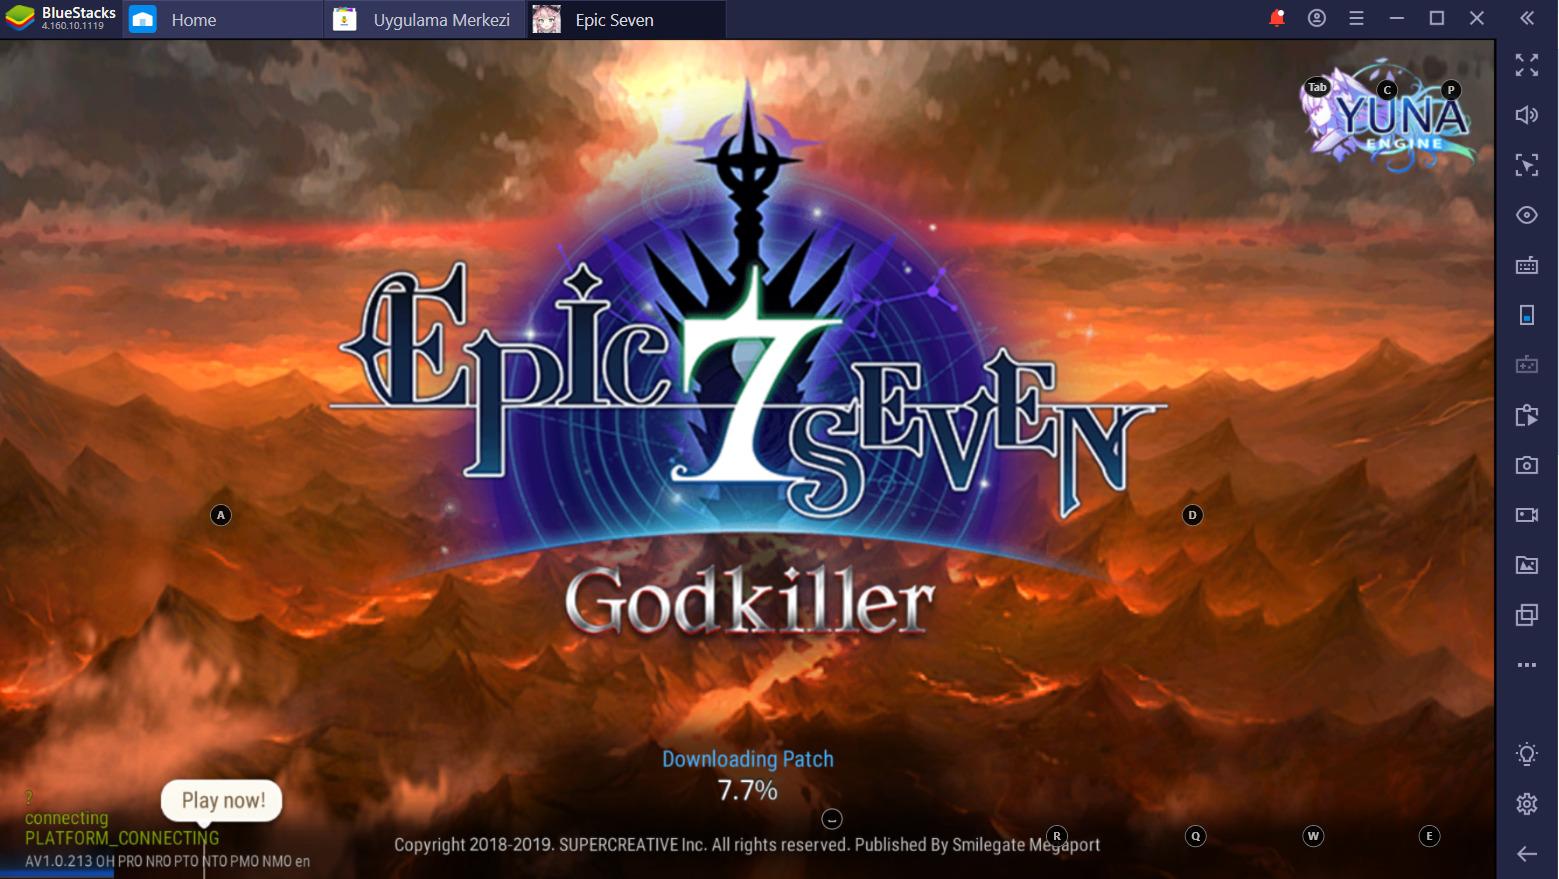 Epic Seven BlueStacks ile PC Kurulum Rehberi